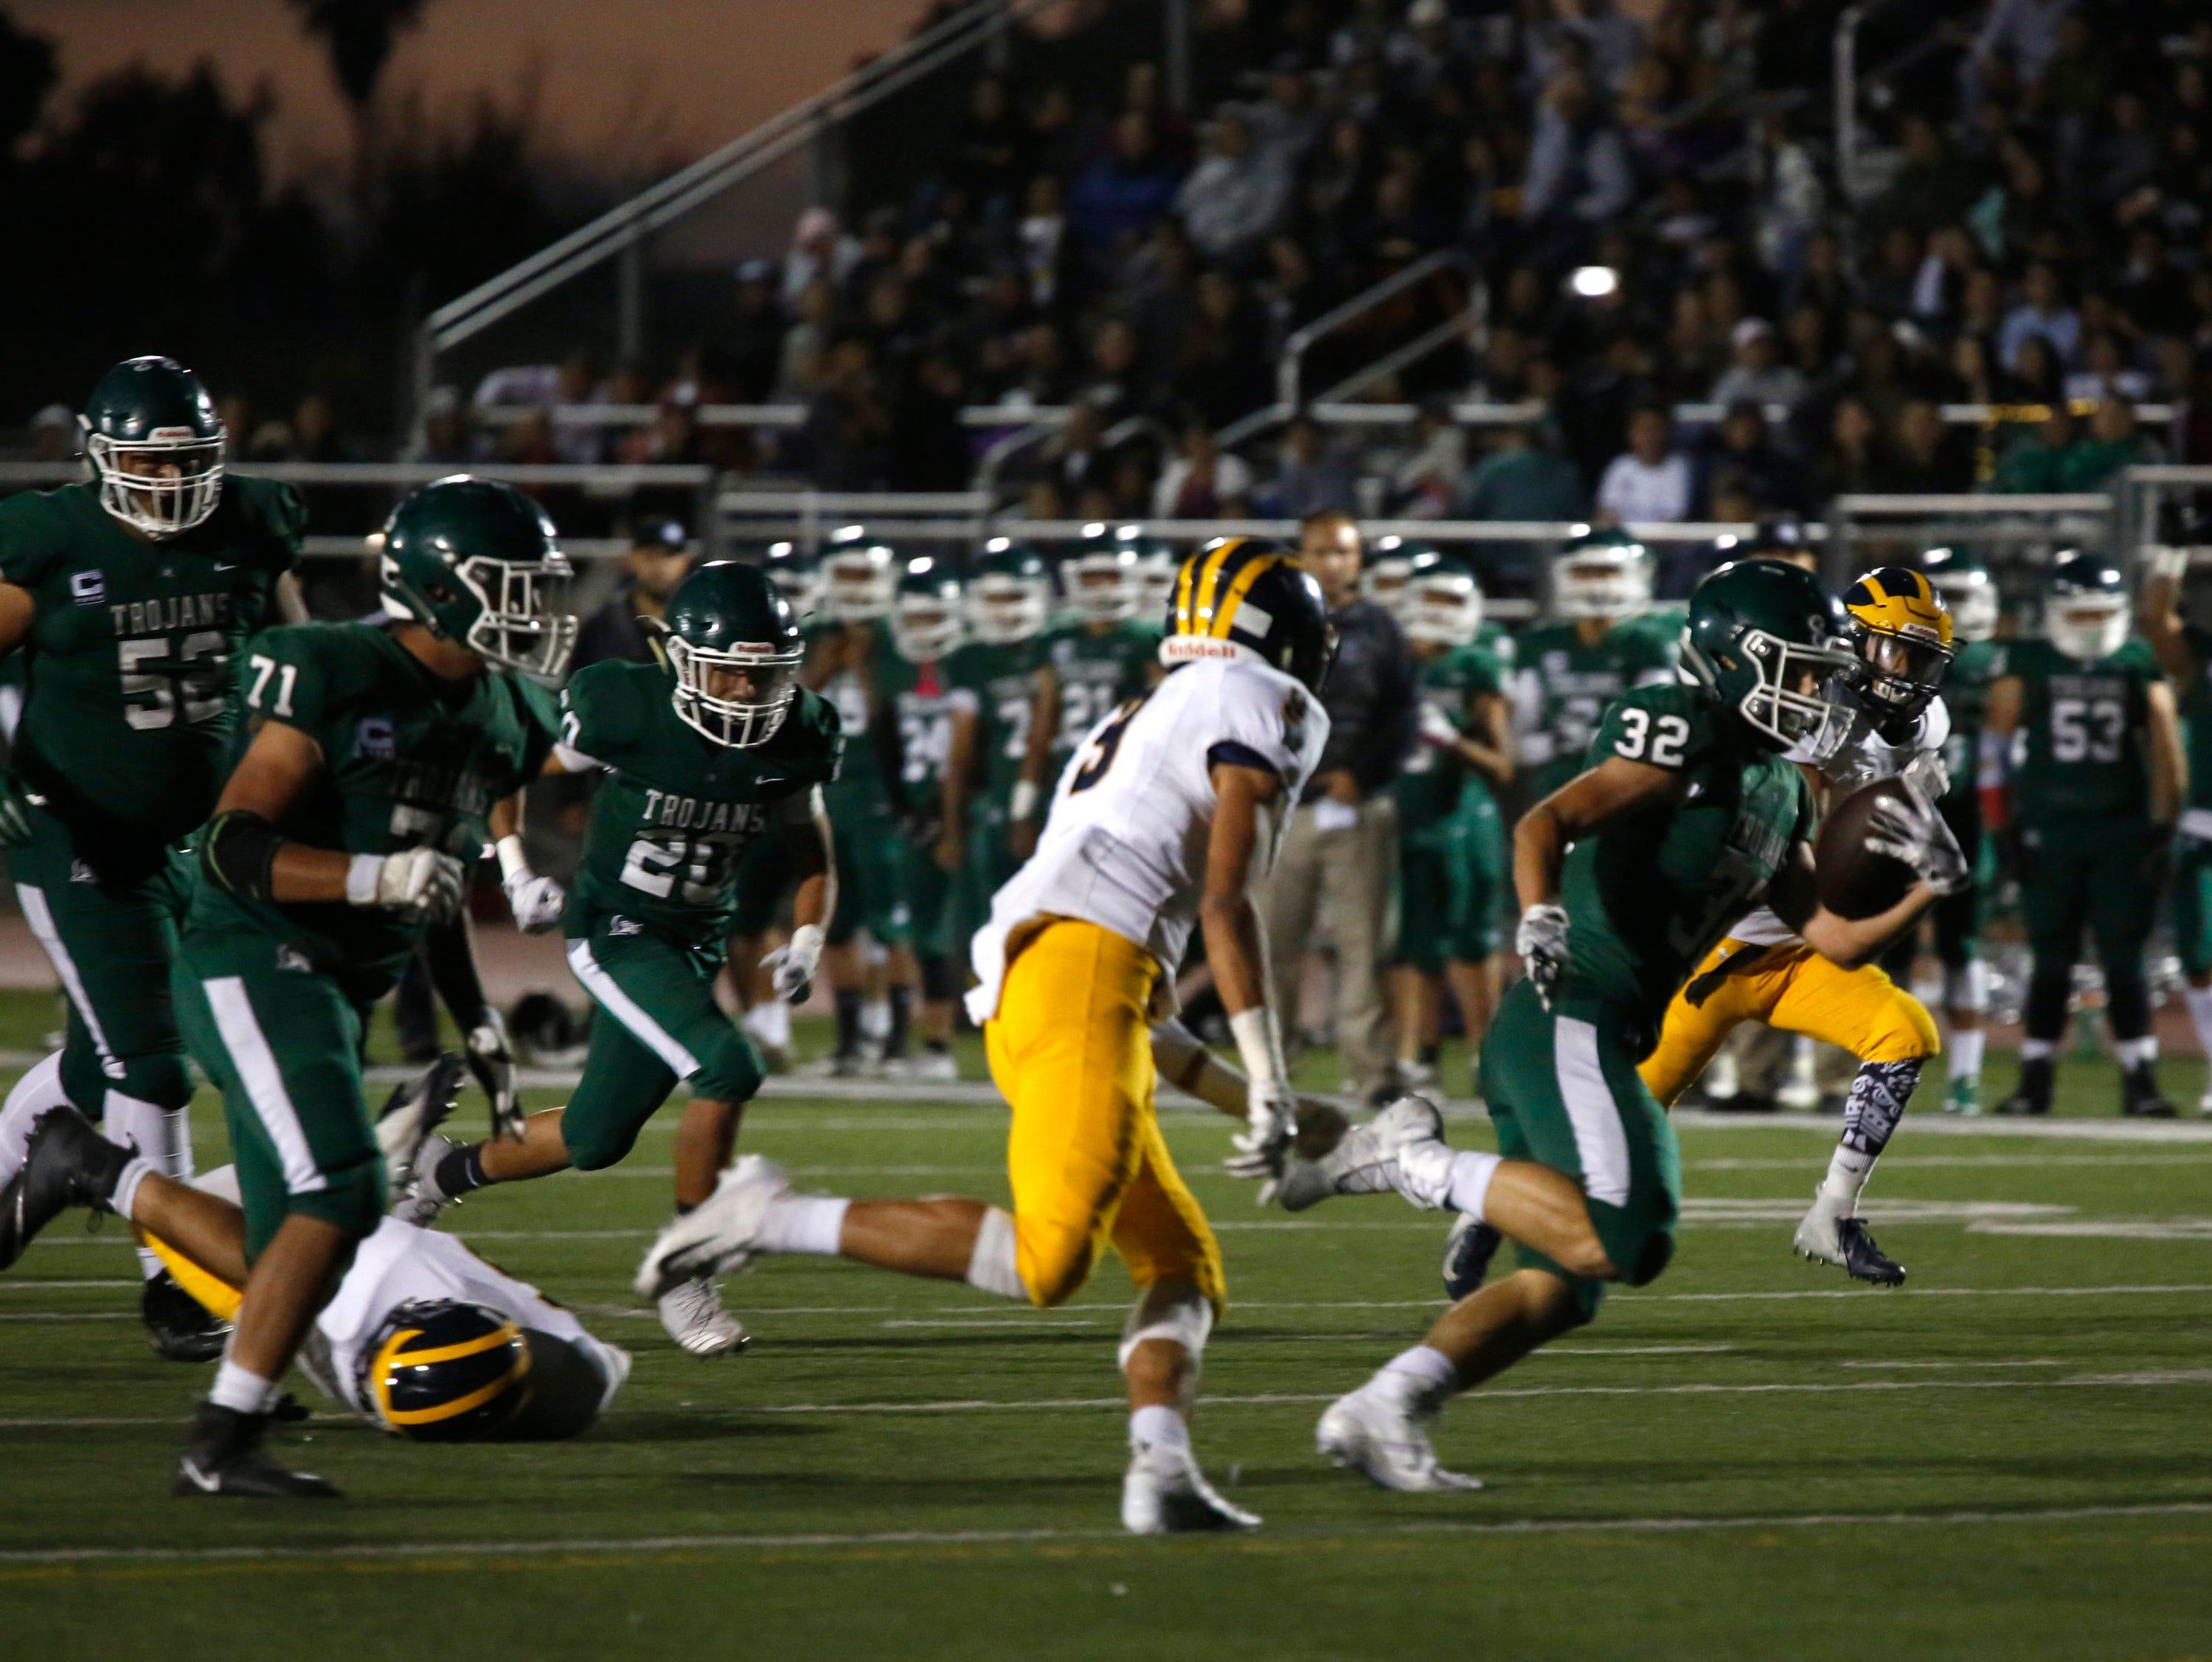 Alisal's Dorian Segovia runs the ball against Everett Alvarez during football at Alisal High School in Salinas on Friday August 31, 2018. (Photo By David Royal)